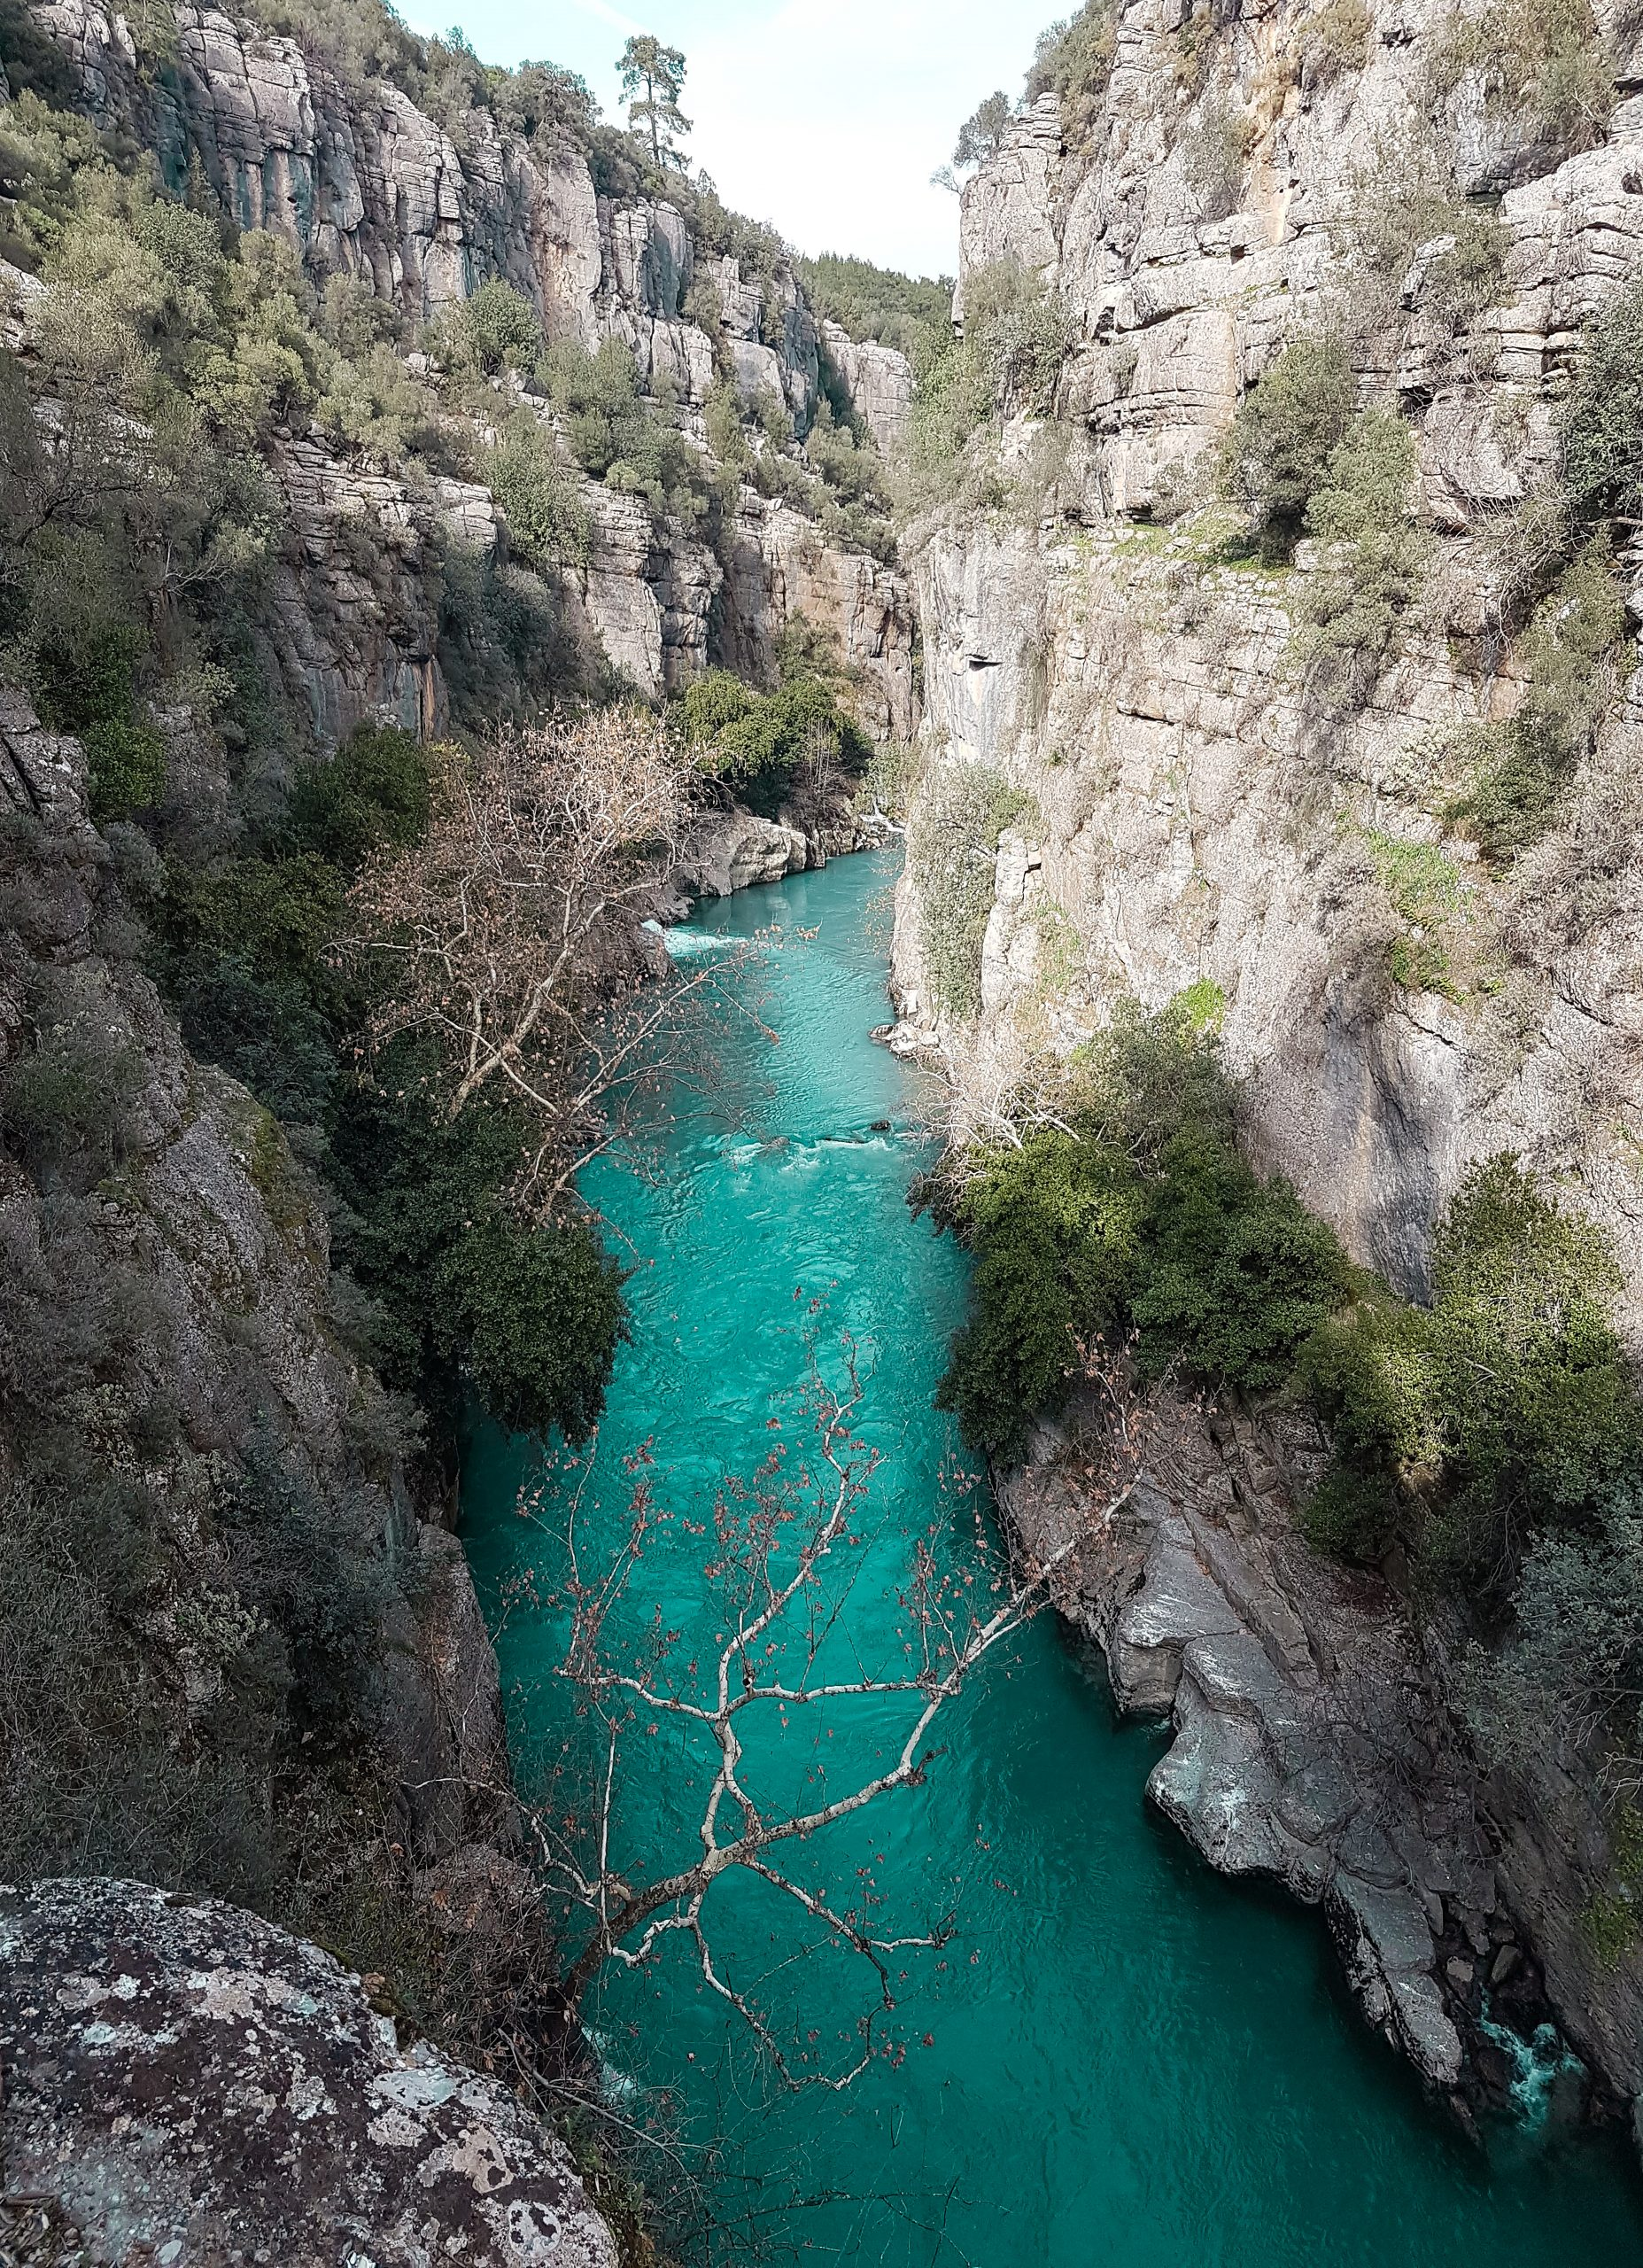 Tazı canyon in Antalya